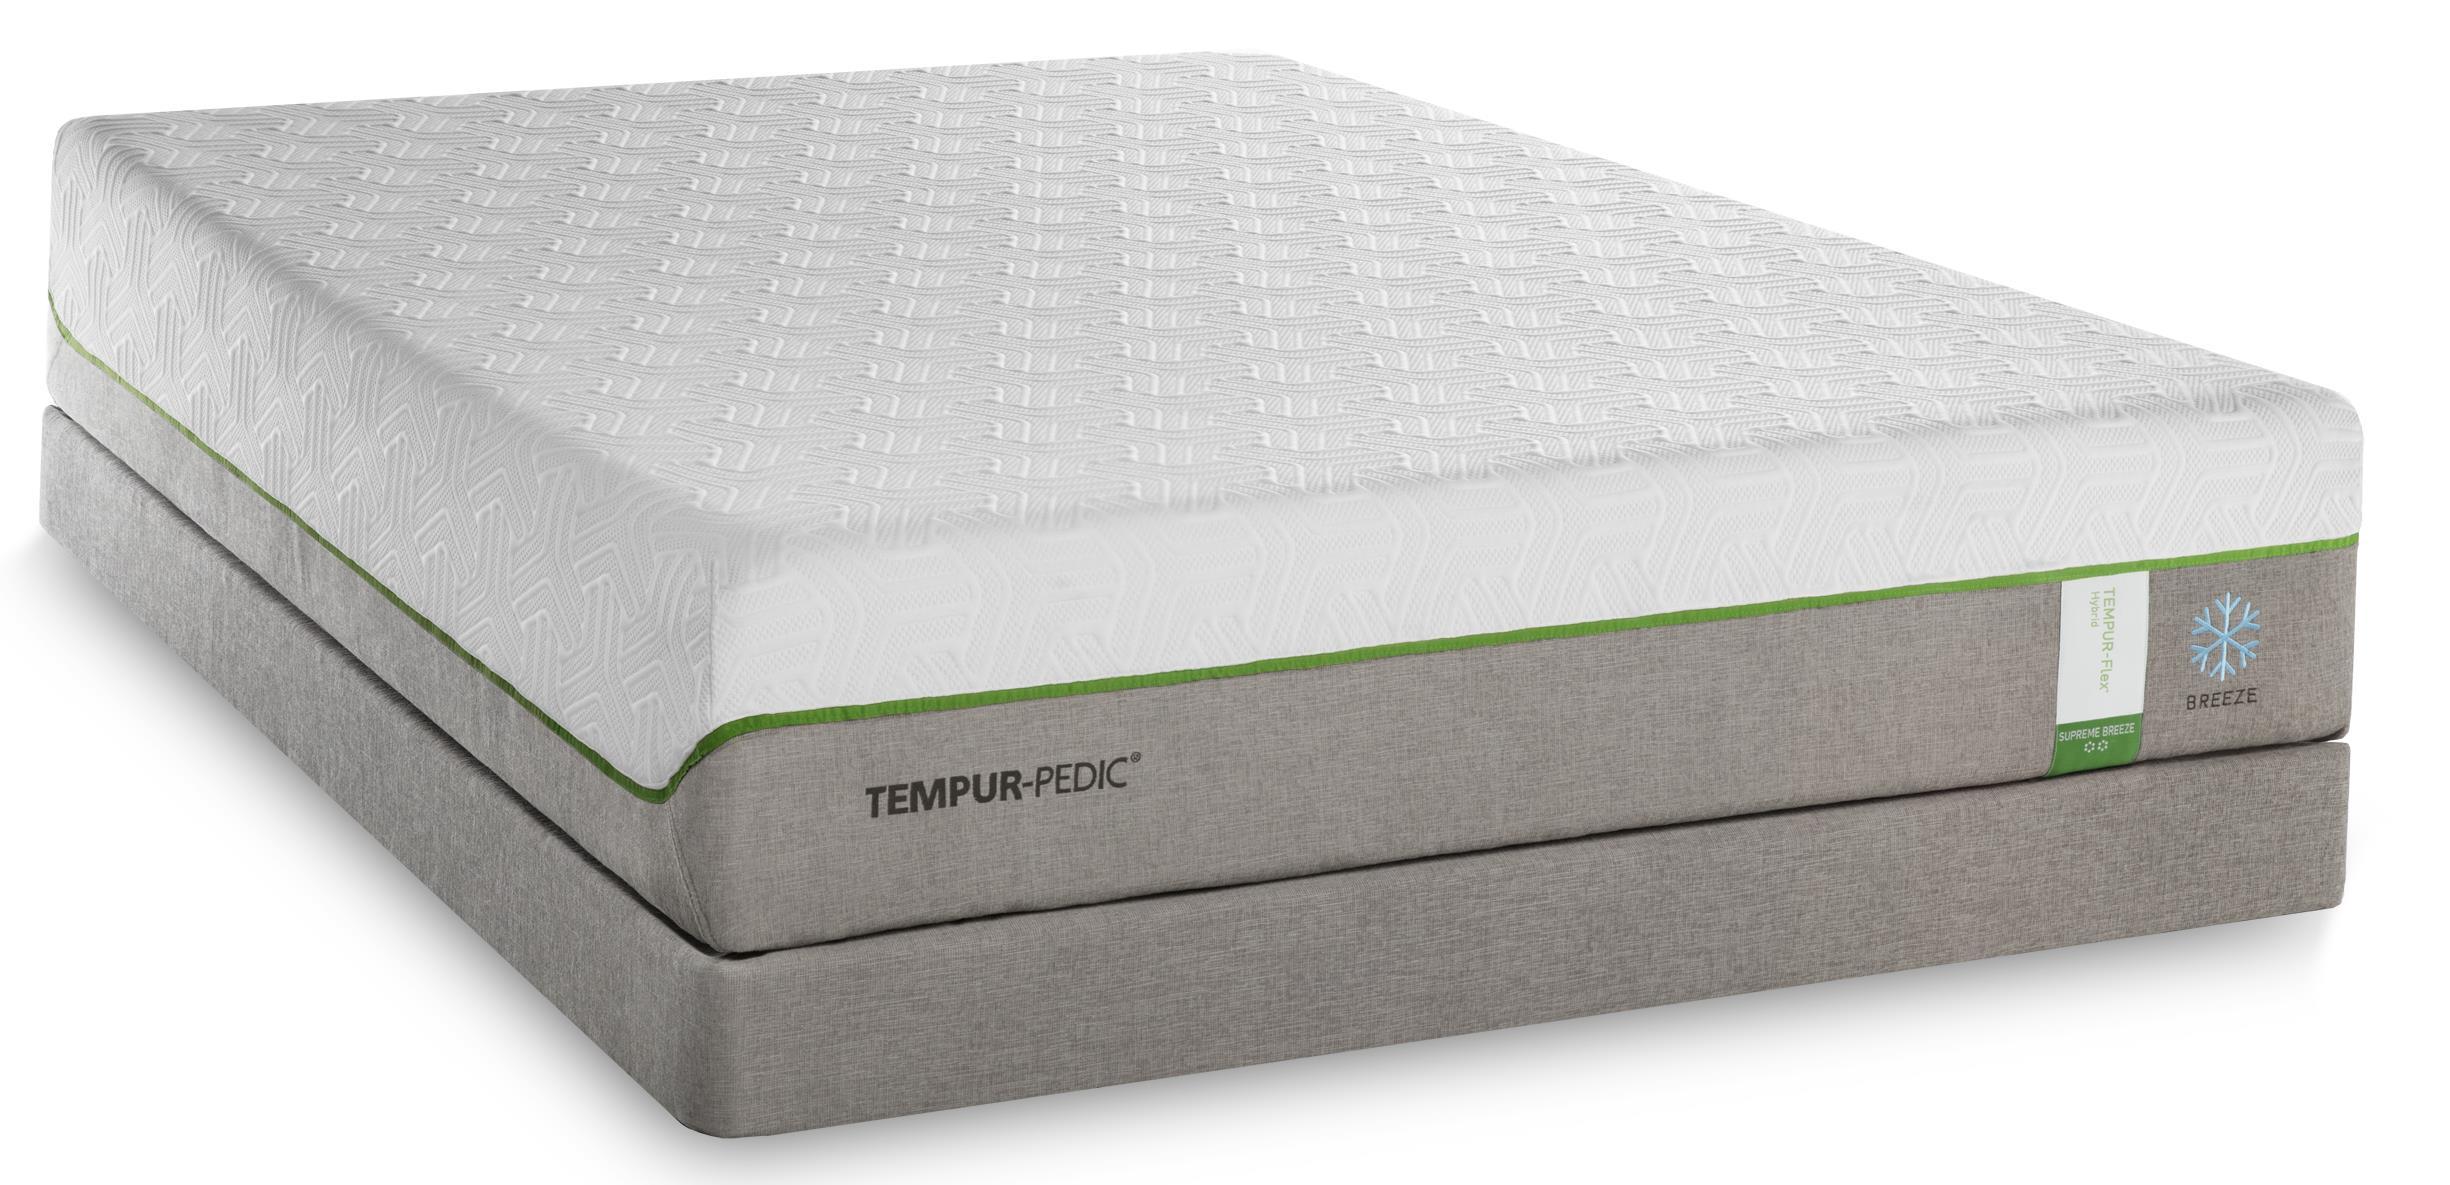 Tempur-Pedic® TEMPUR-Flex Supreme Breeze California King Medium Plush Matt Set, Adj - Item Number: 10292280+2x25289290